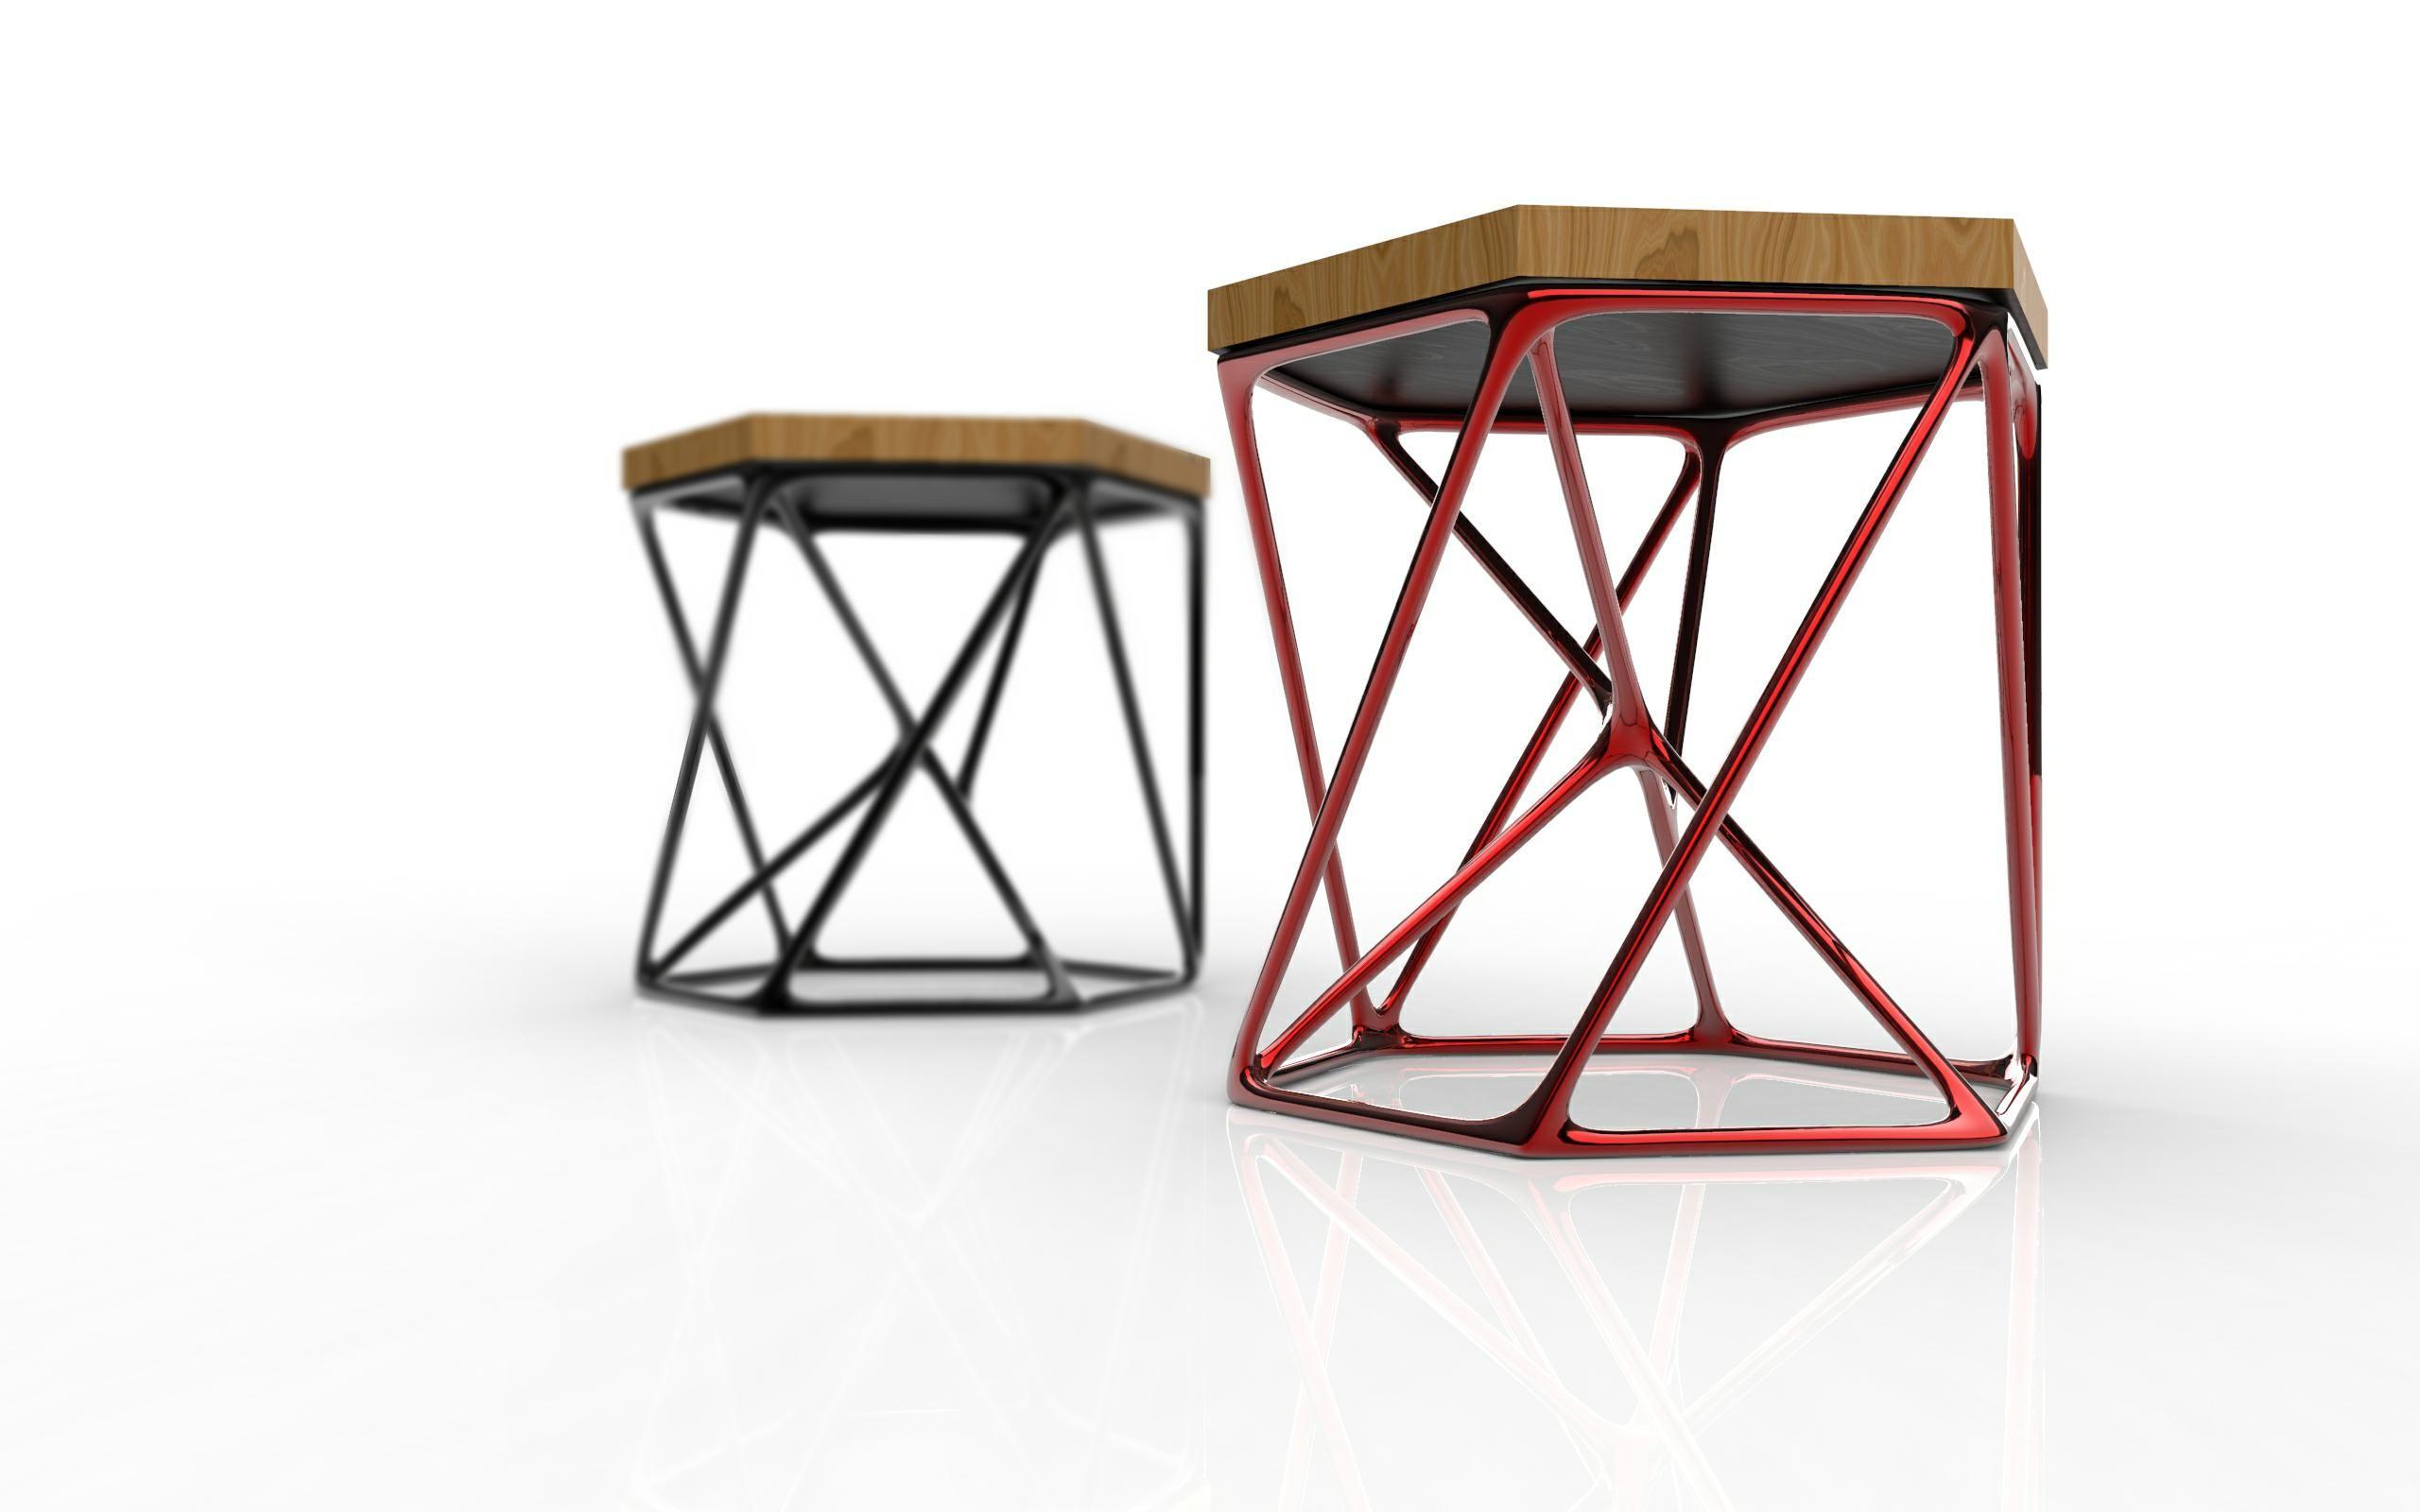 Fabrica-de-nerdes---design-ind3-lcs19-makers-3500-3500